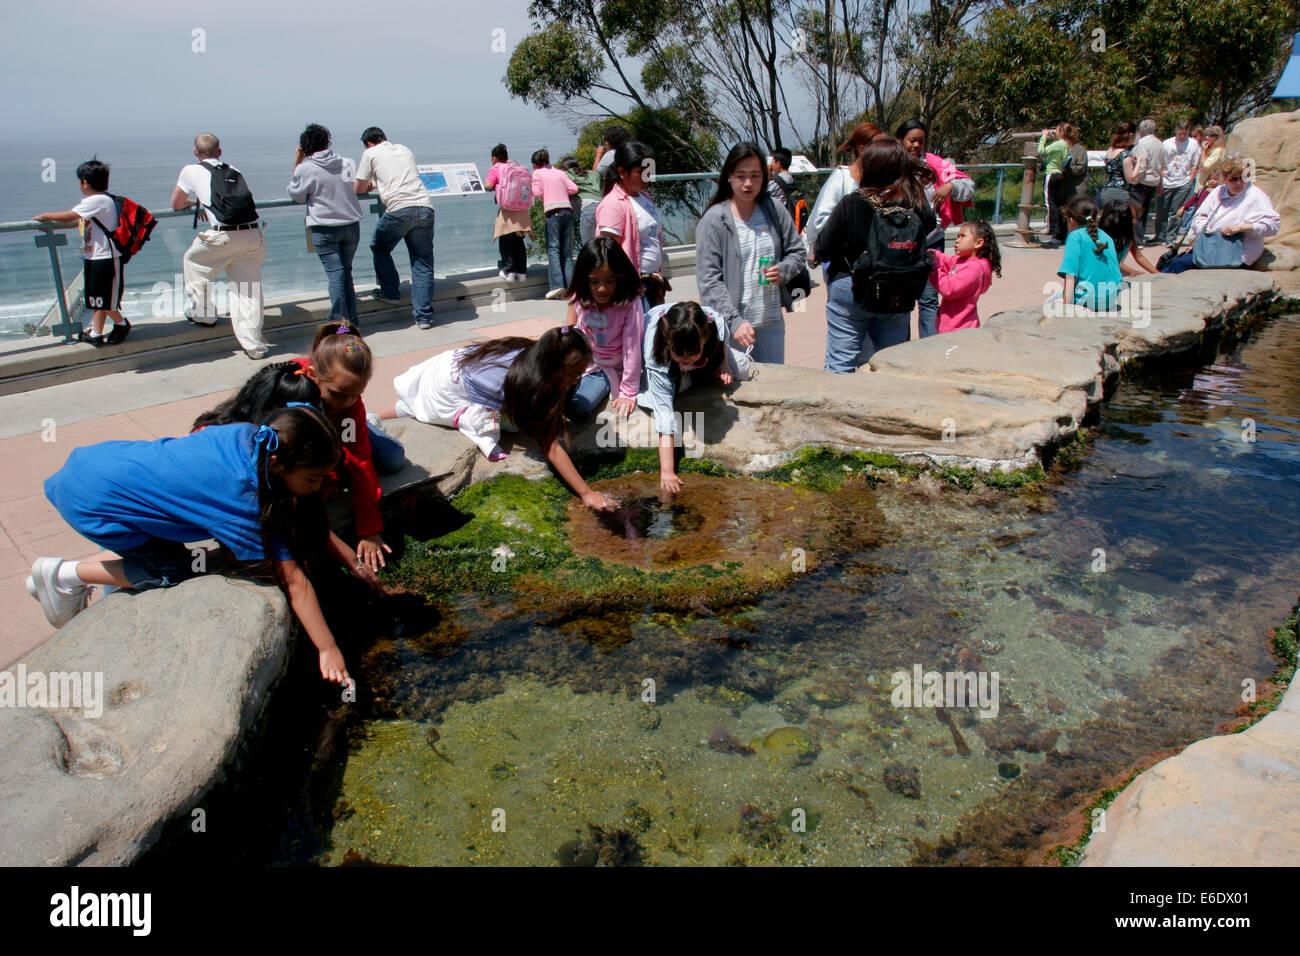 Birch Aquarium At Scripps, La Jolla, California, USA. - Stock Image